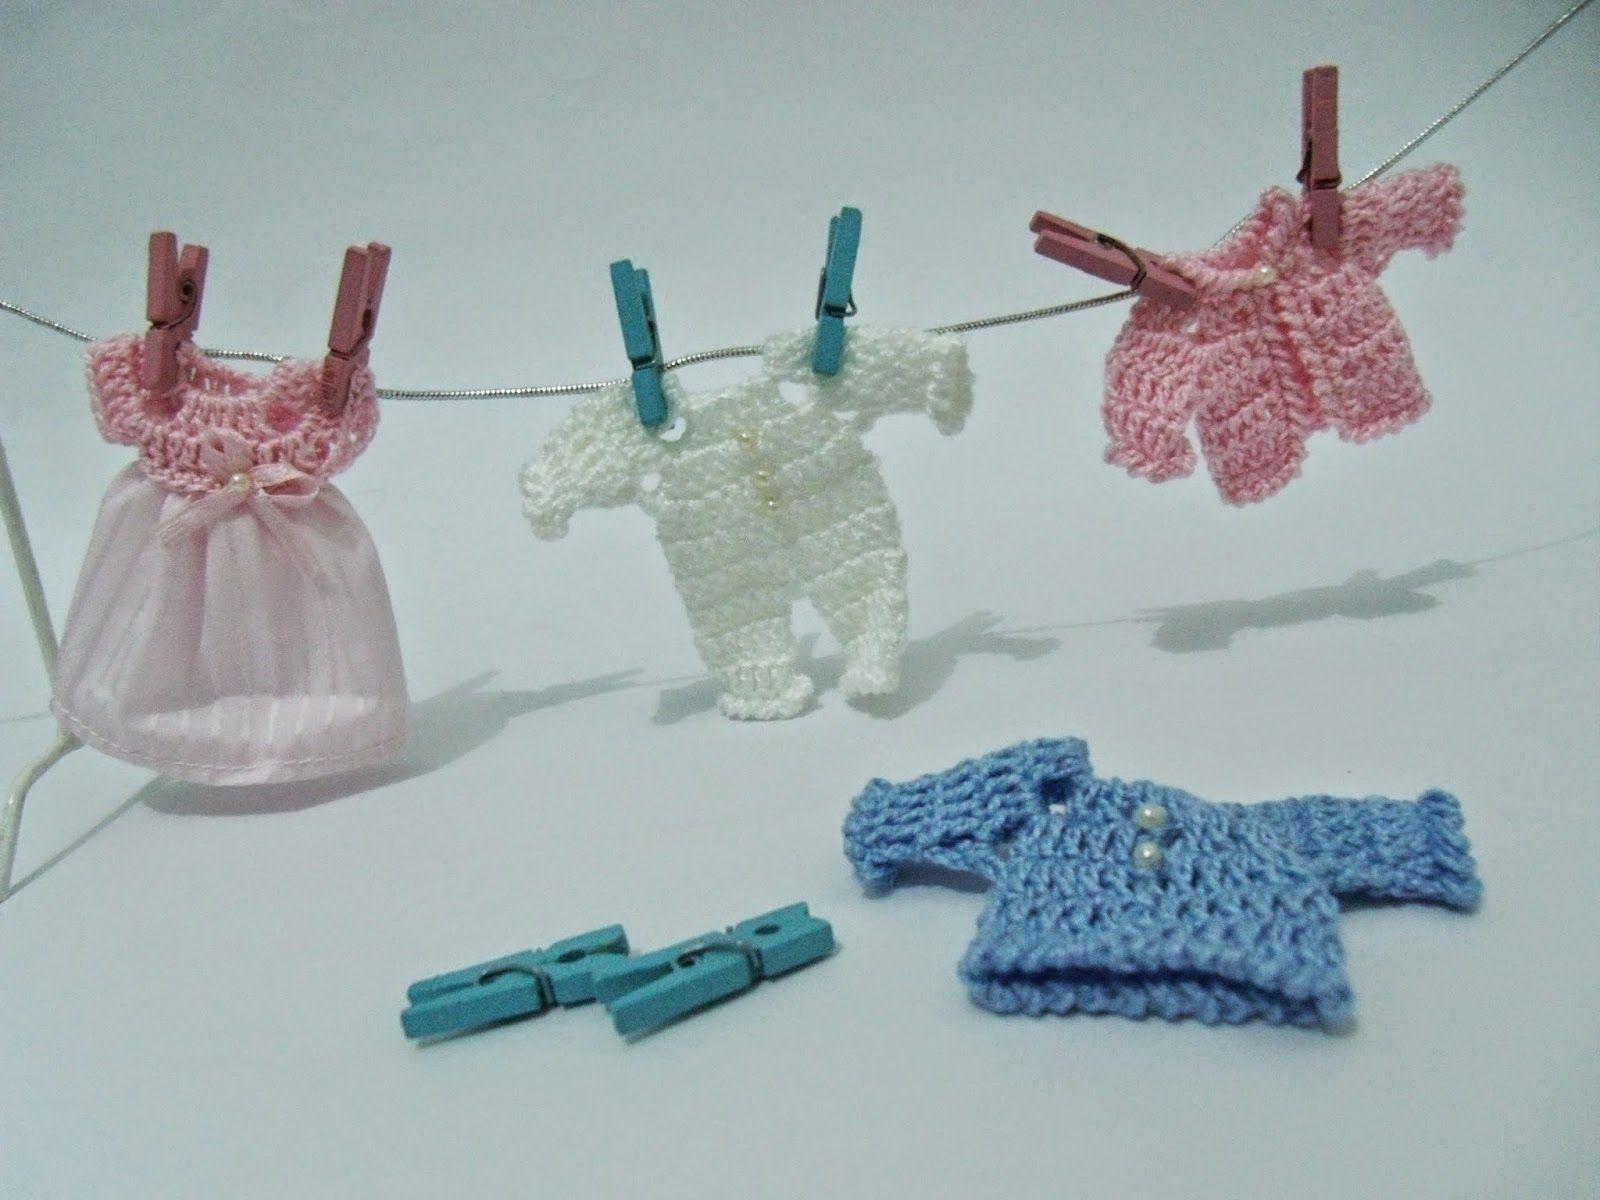 miniatura asas crochê - Pesquisa Google